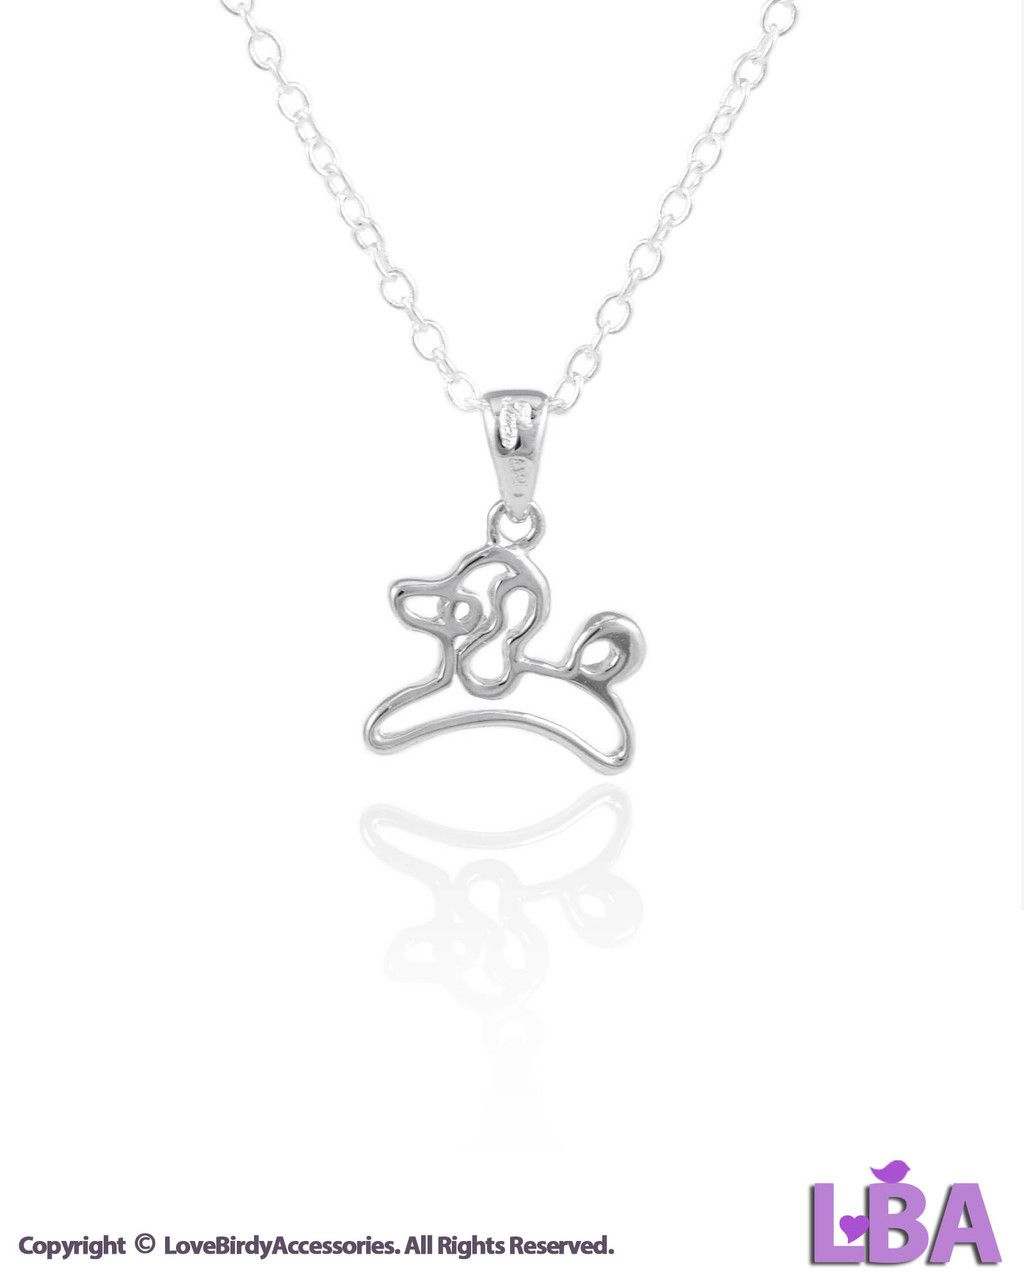 (100 Guaranteed 925 Sterling Silver) Dog Jewelry